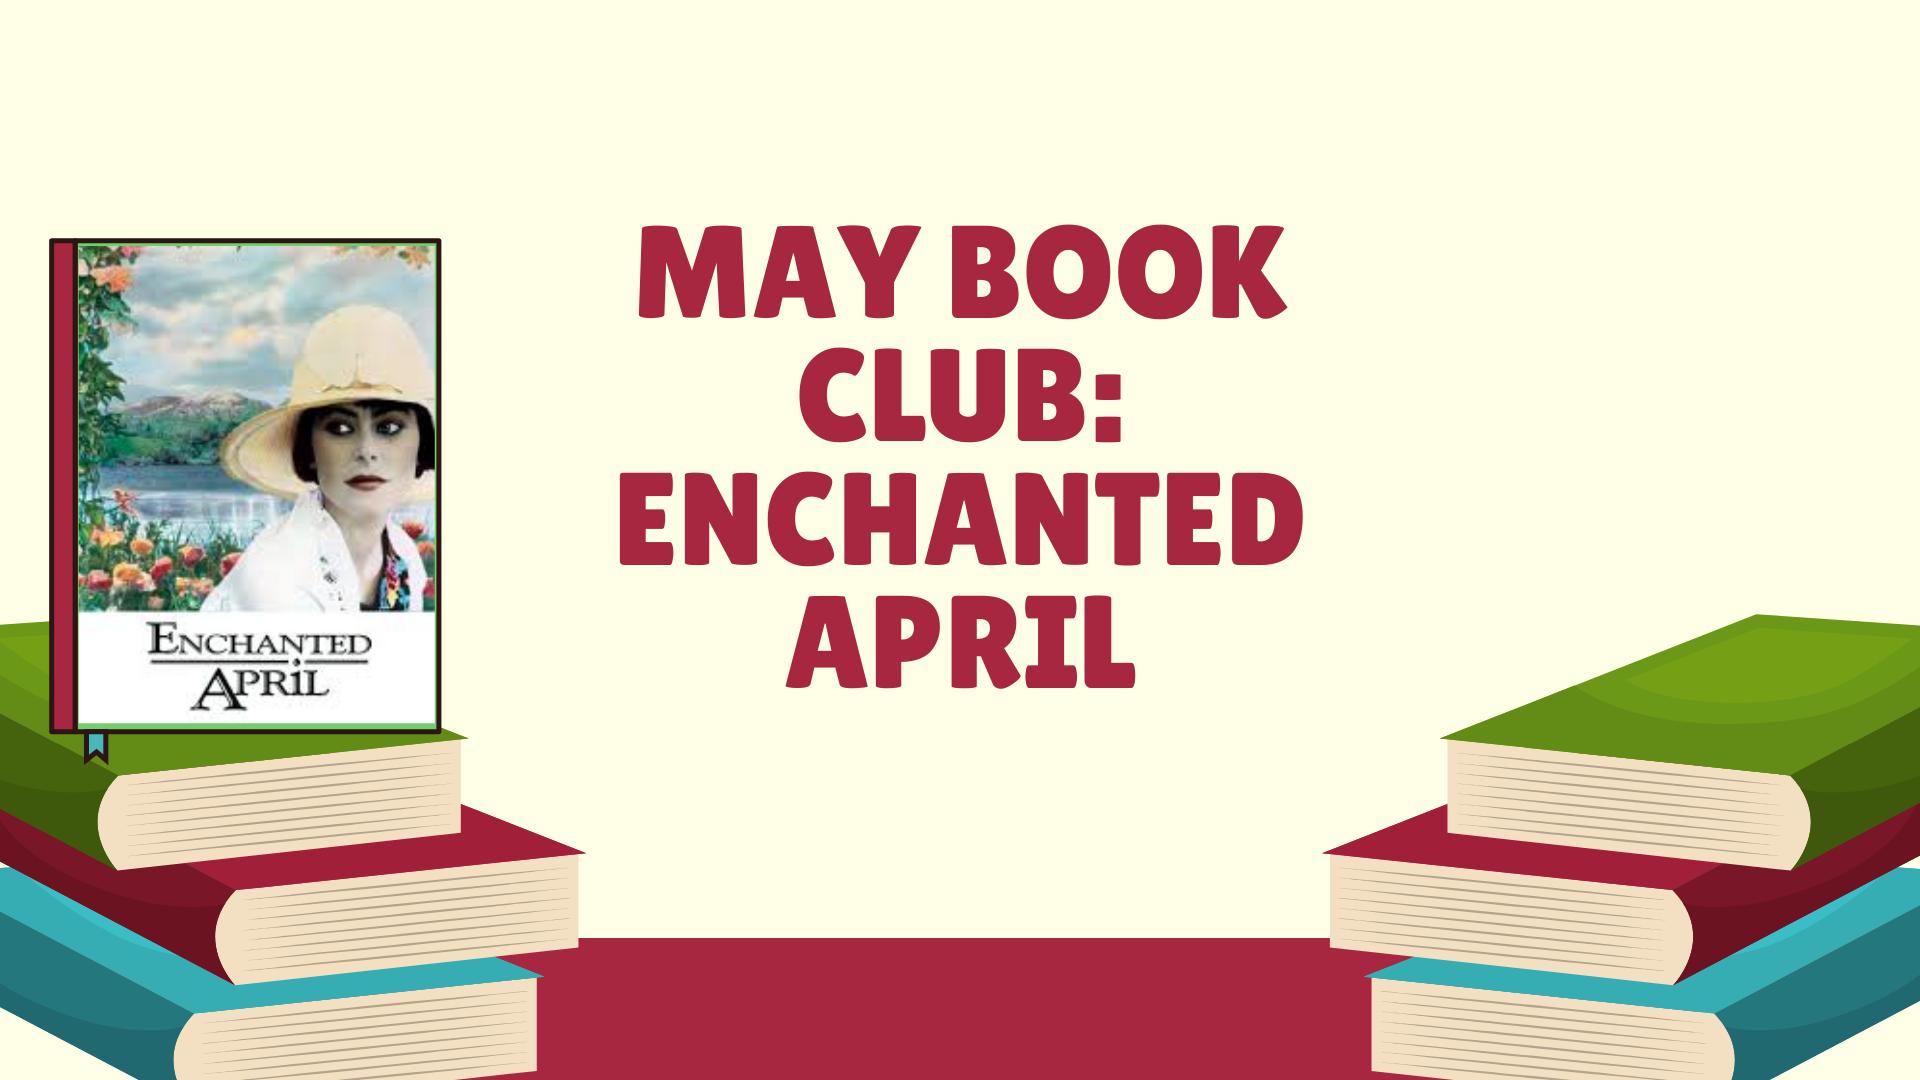 Book Club - Enchanted April